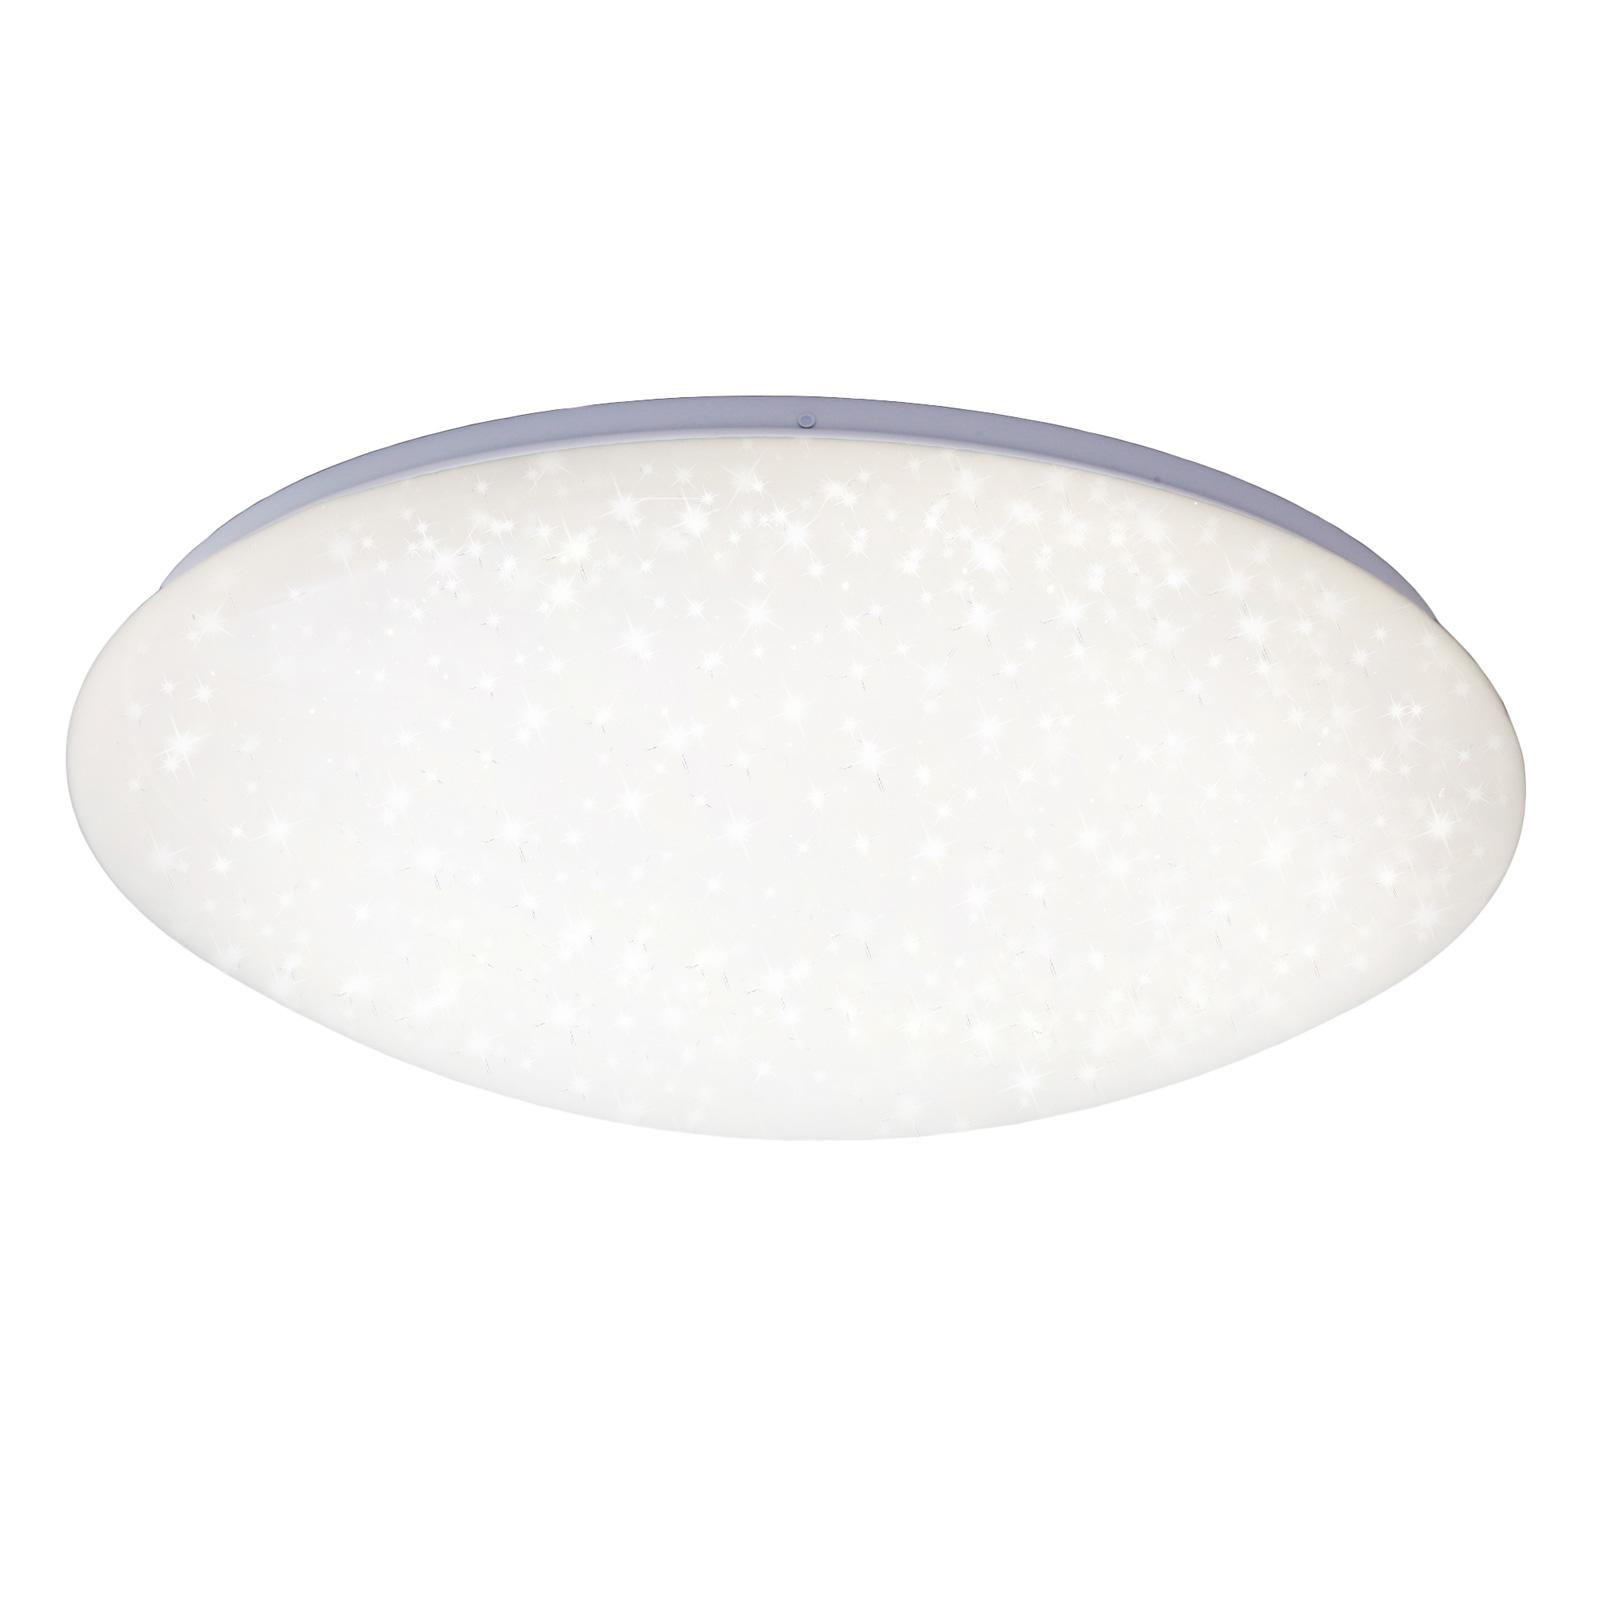 LED-taklampe 3226-016 stjernehimmel-effekt 49 cm